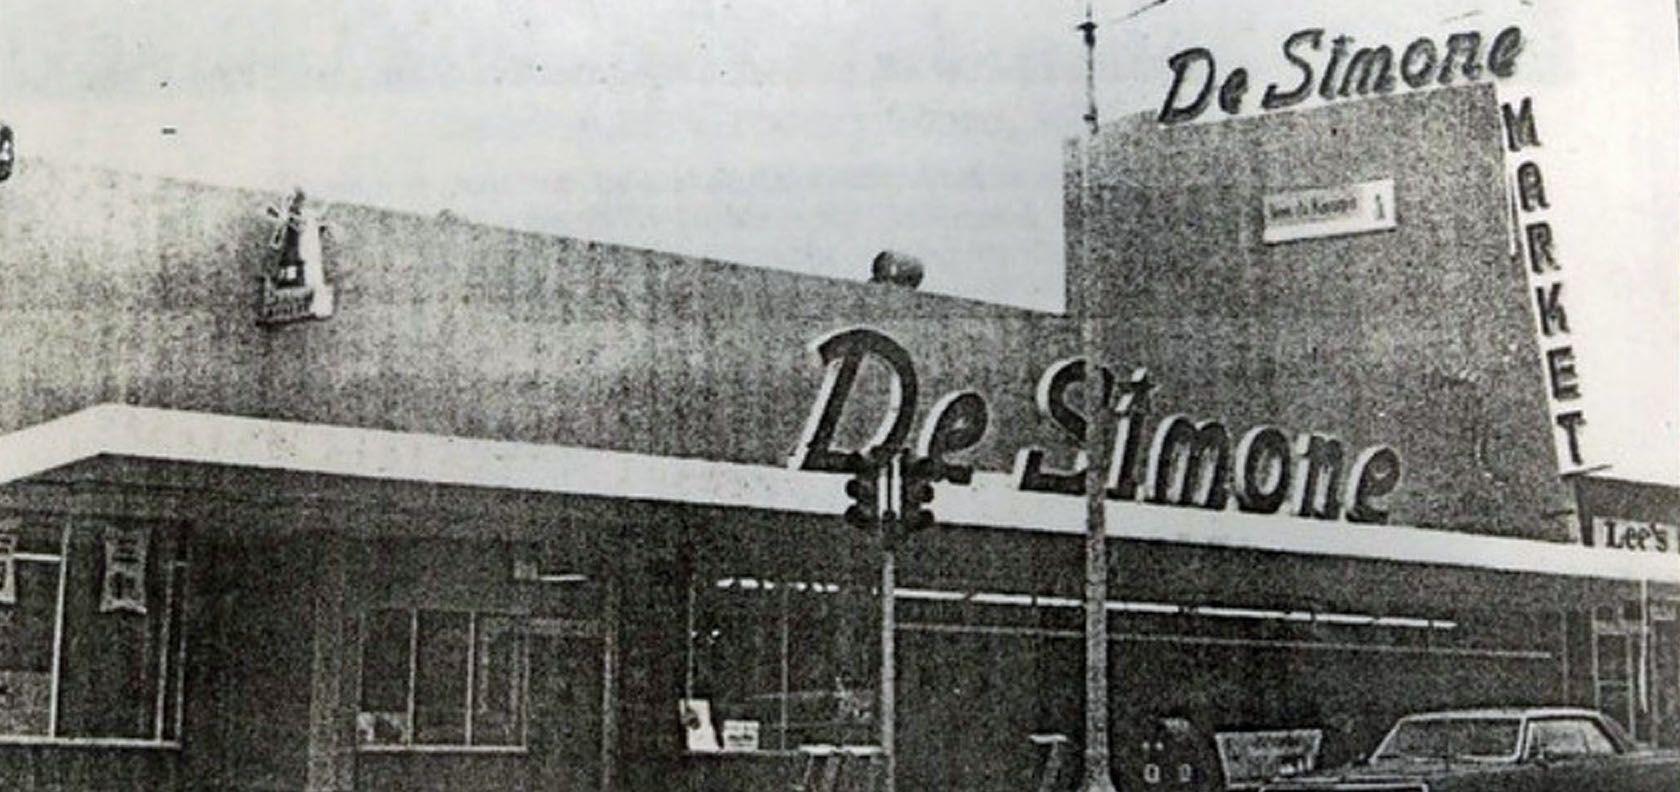 1970's RB store Redondo beach california, South bay area